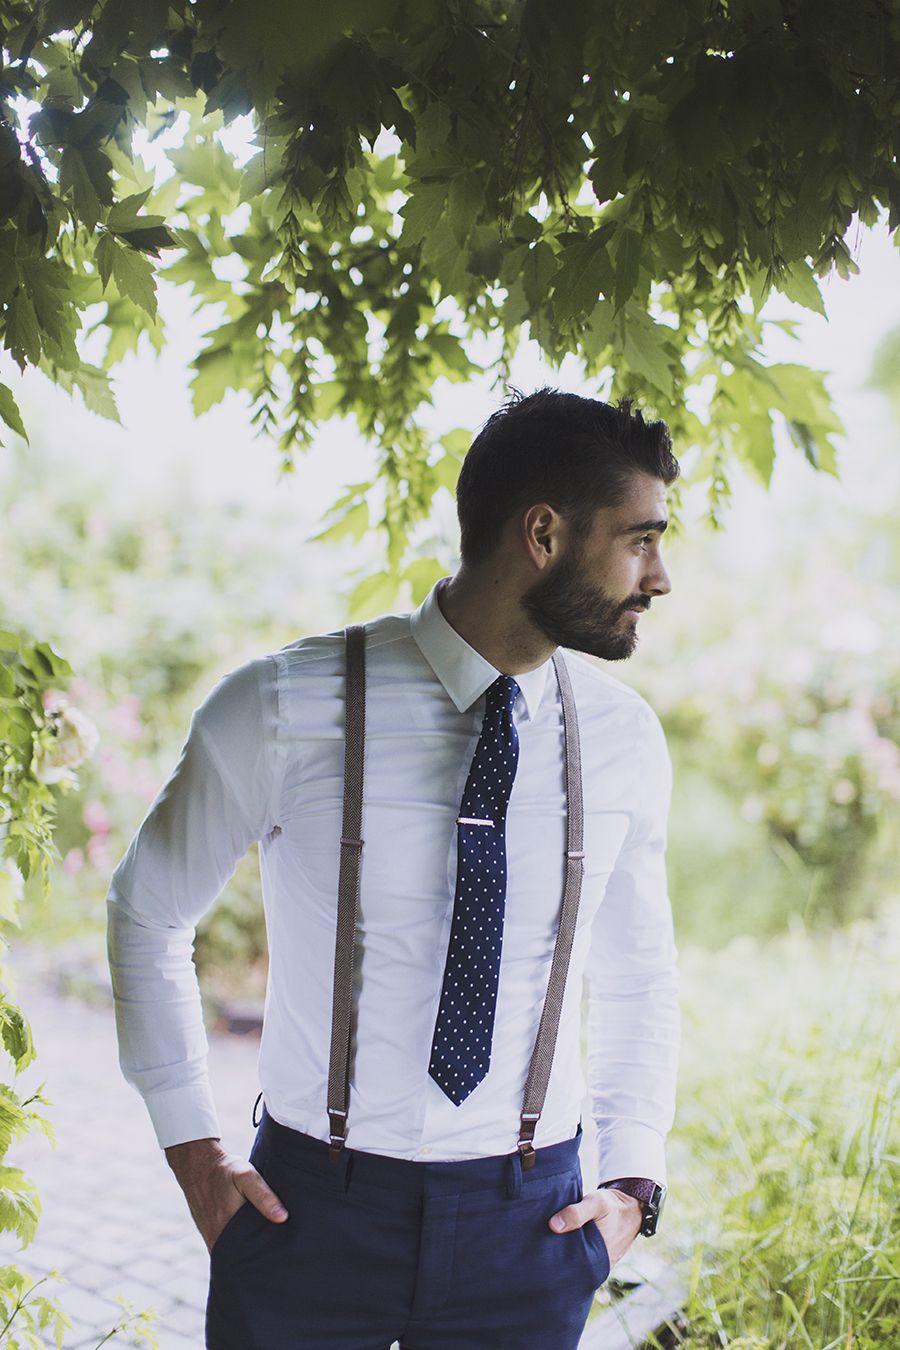 Backyard wedding inspiration full of easy elegance beach